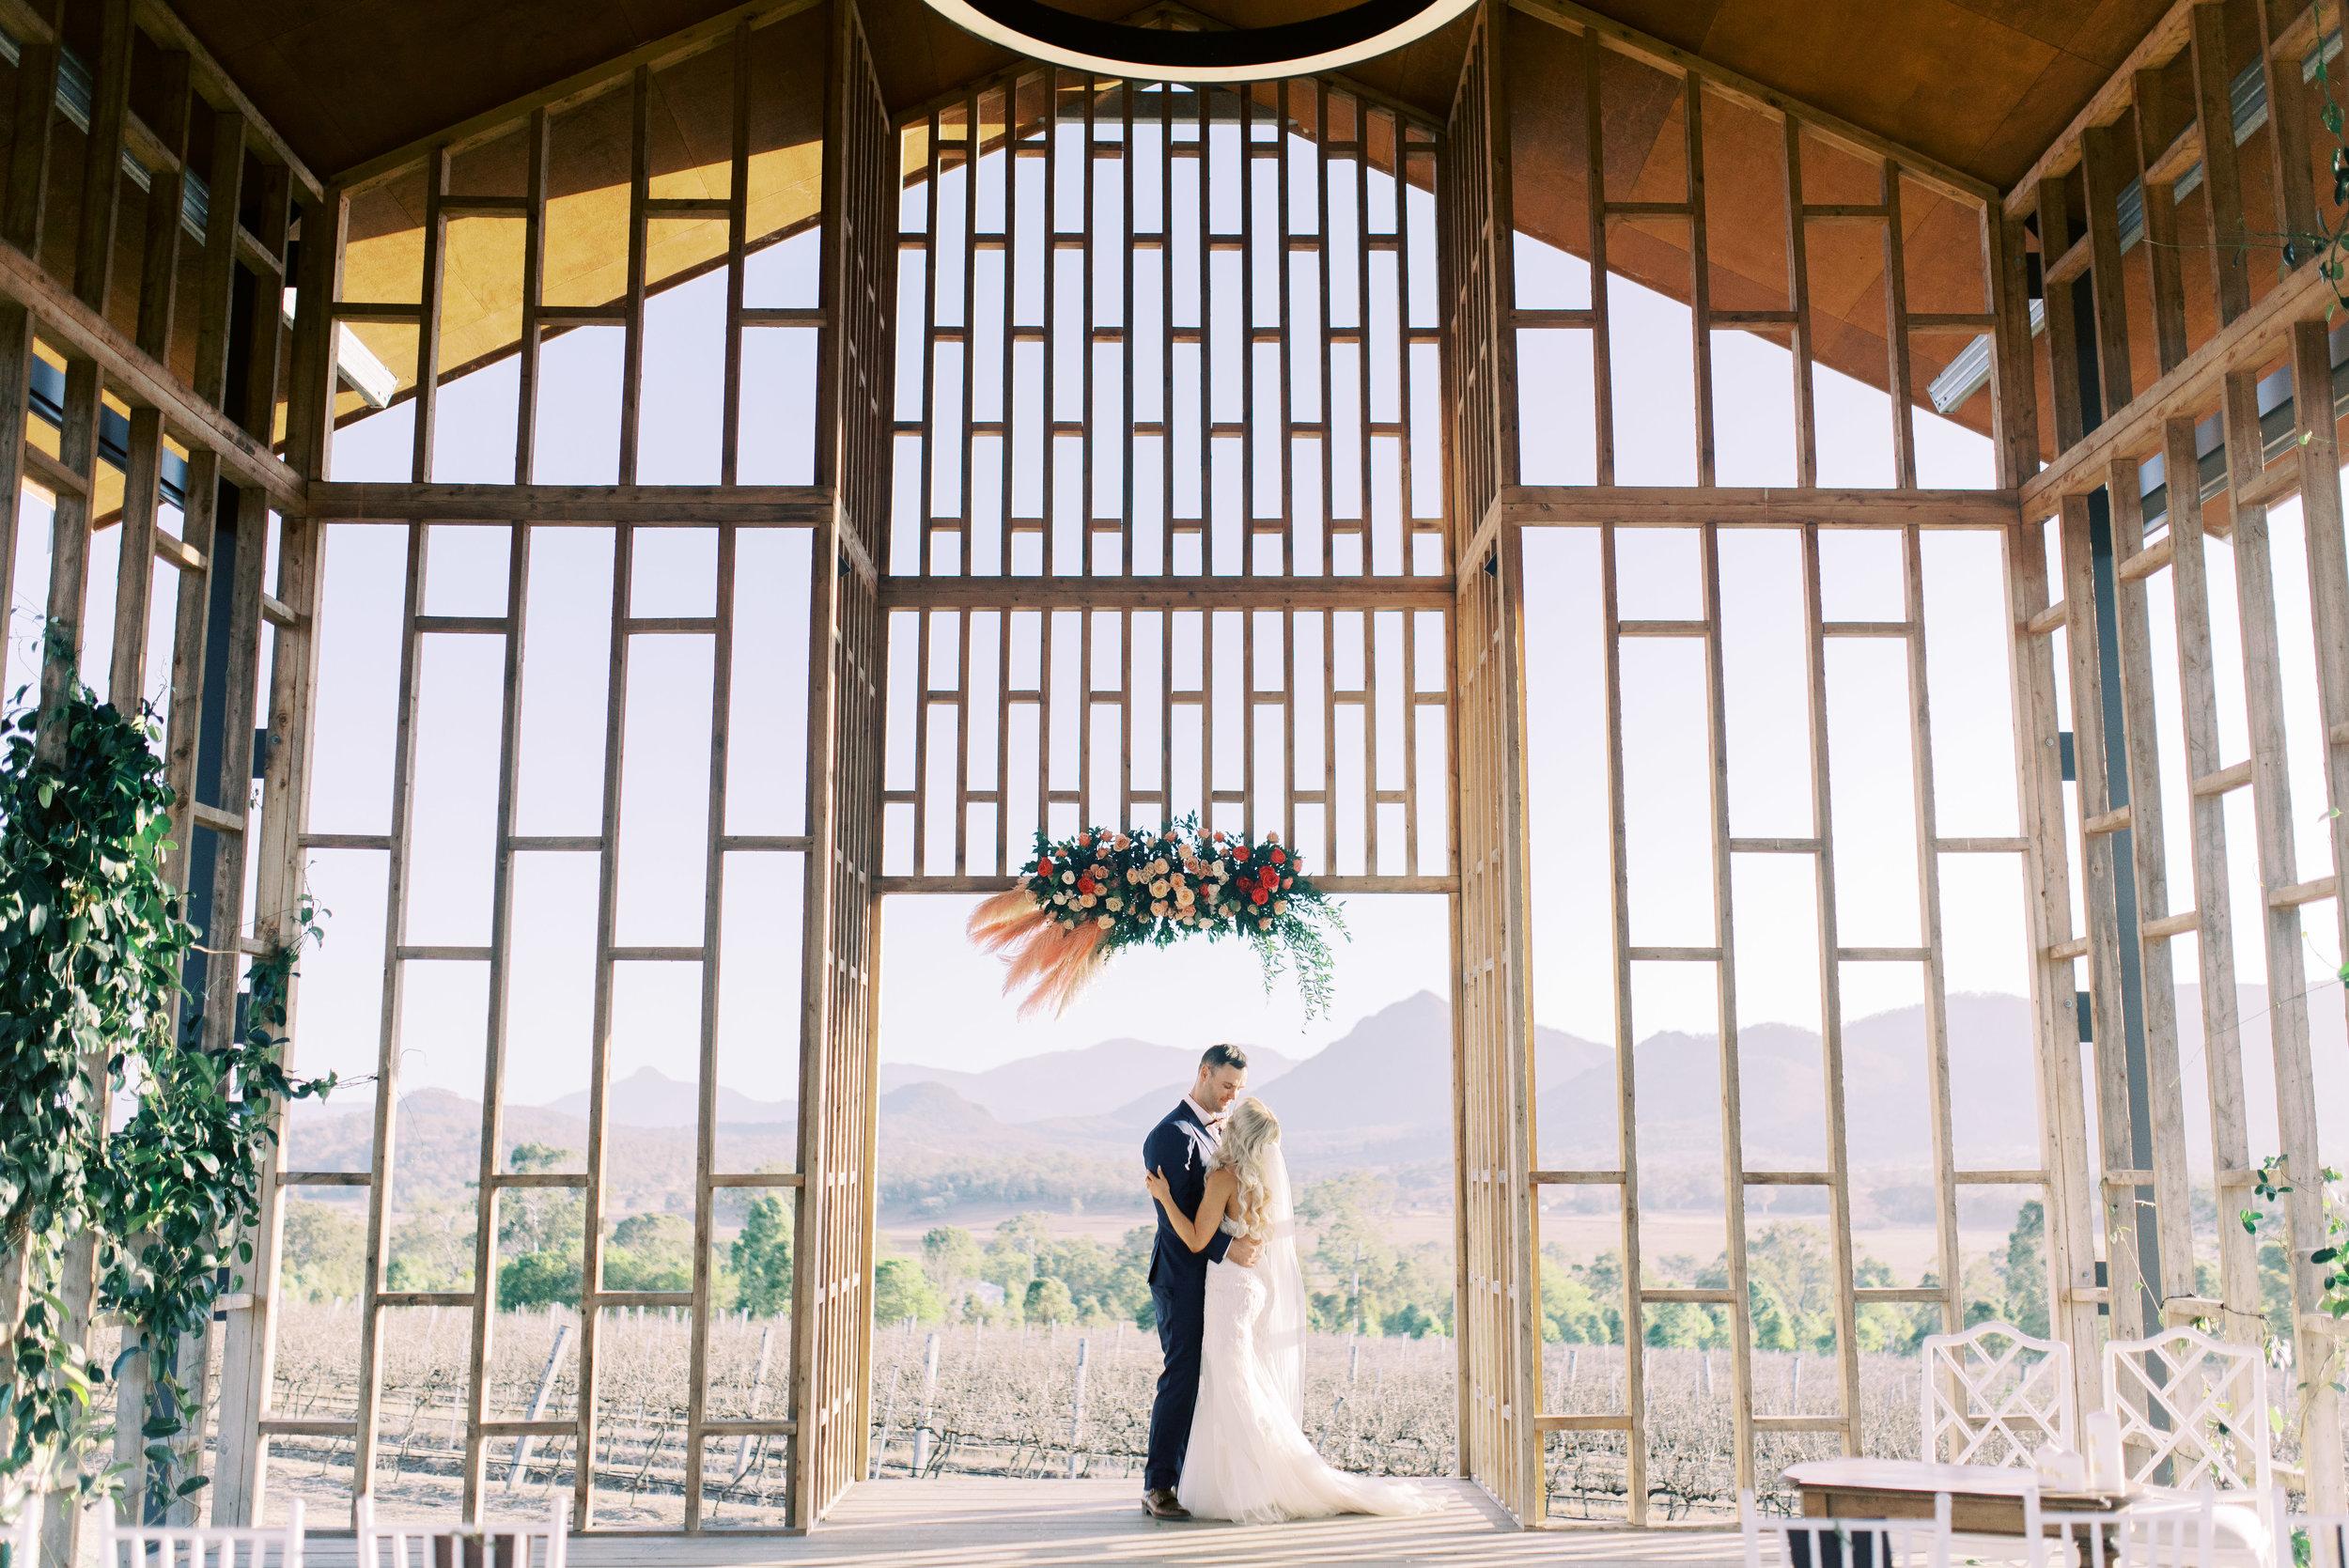 Kooroomba-Vineyard-Lavender-Farm-Wedding-Fine-Art-Lauren-Olivia-63.jpg